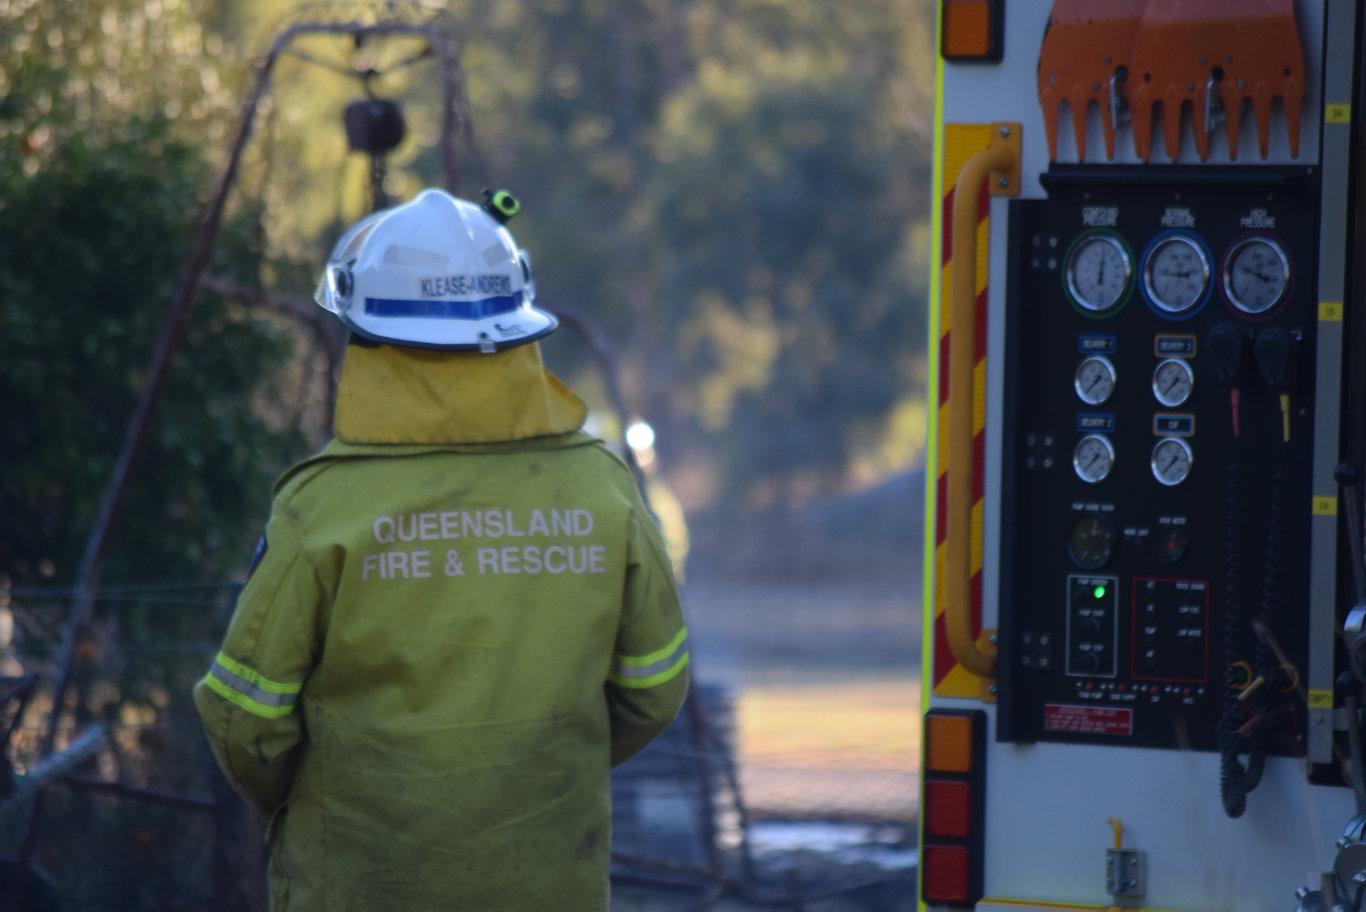 A back yard grass fire at a residence on Creek St Chinchilla.